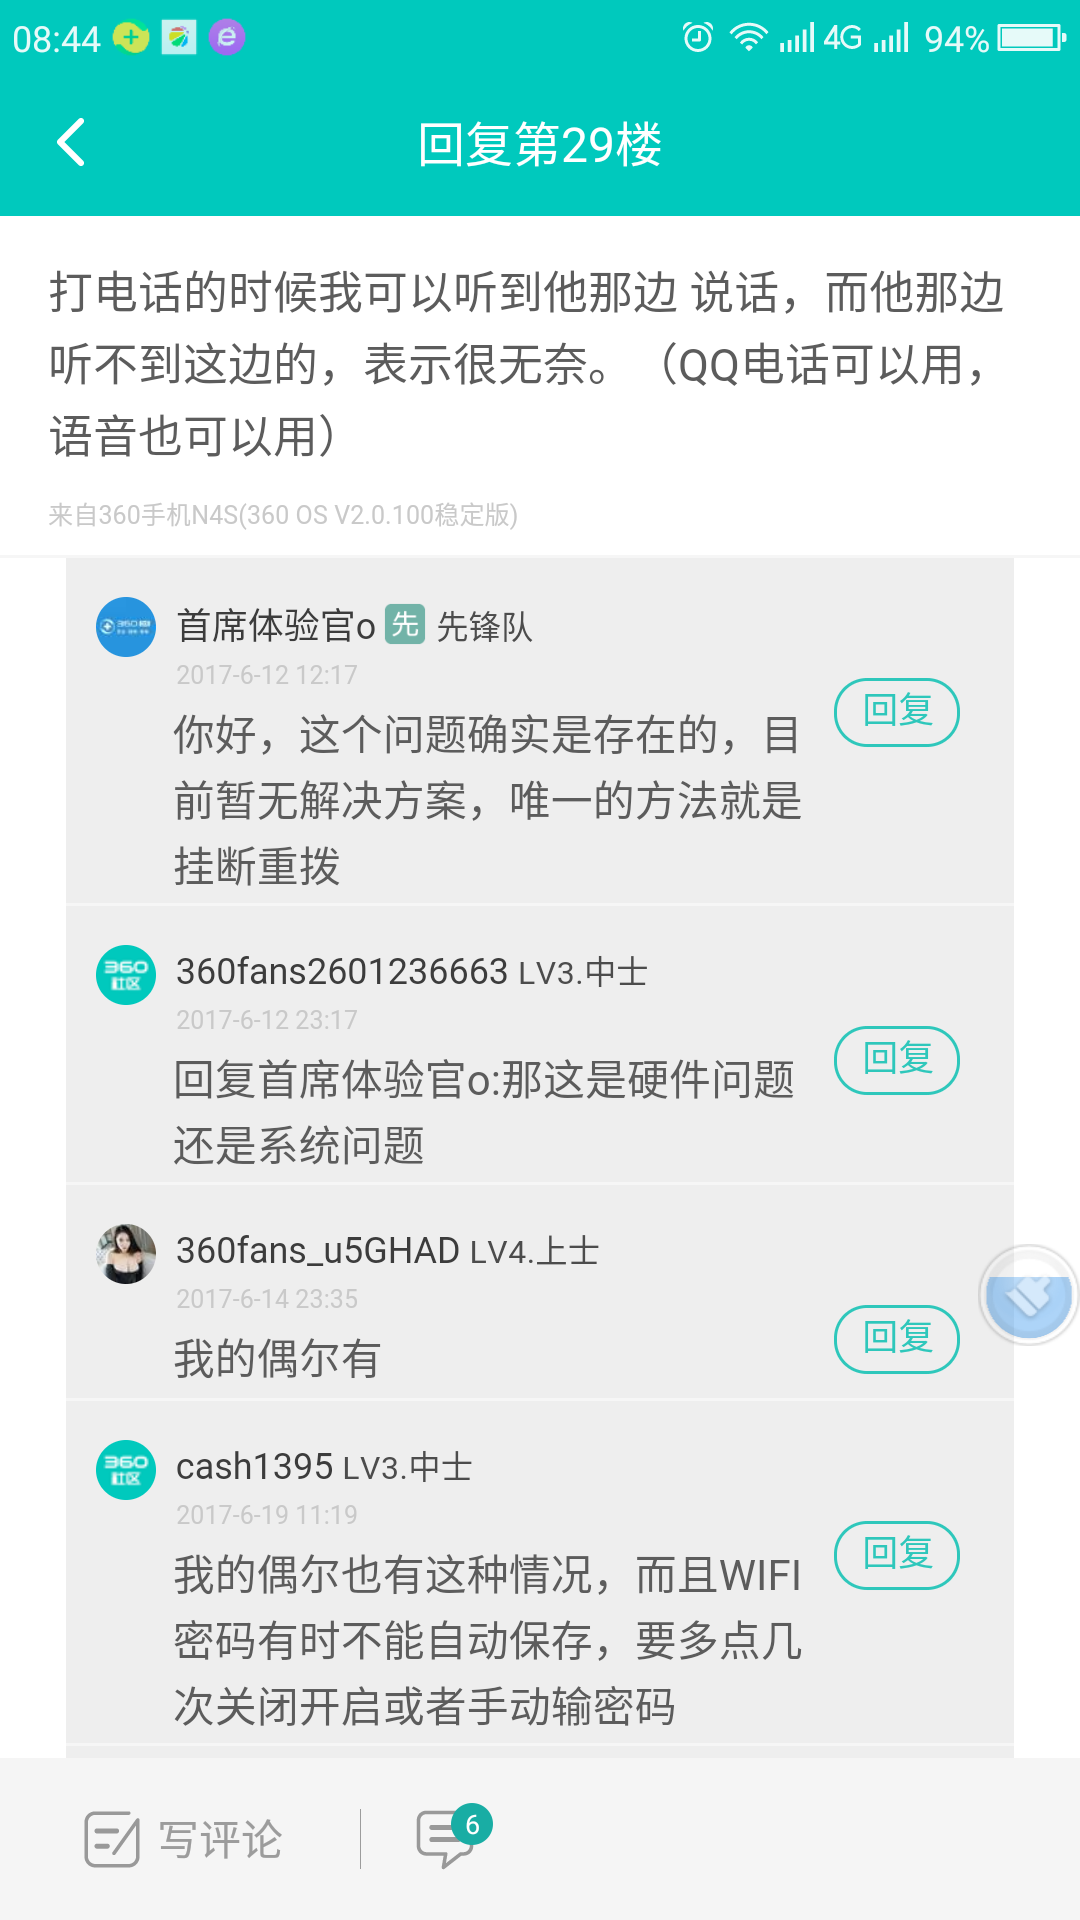 Screenshot_2017-07-09-08-44-57.png